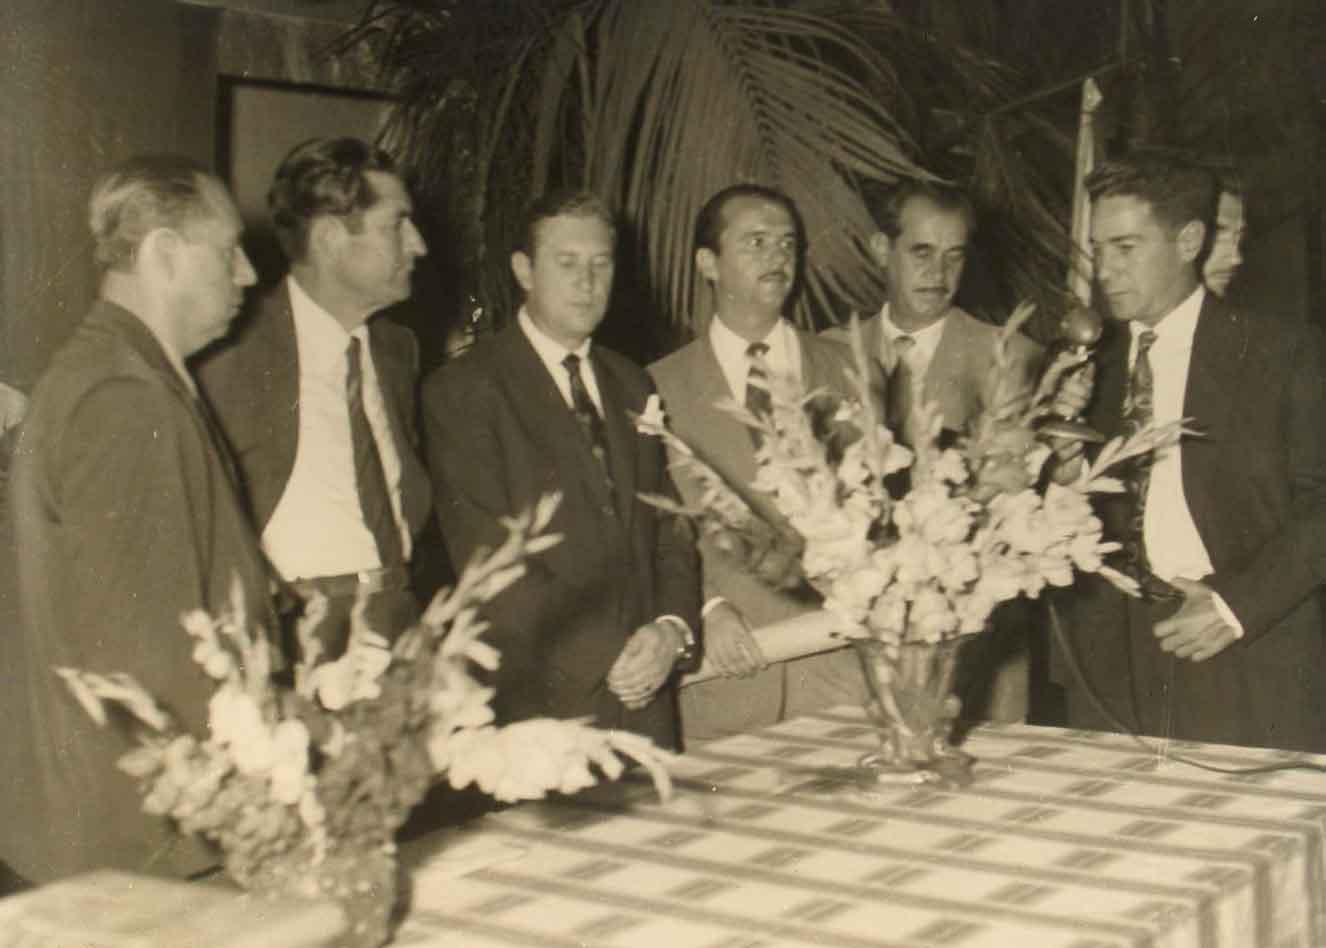 Posse do Prefeito e Vereadores - 1952